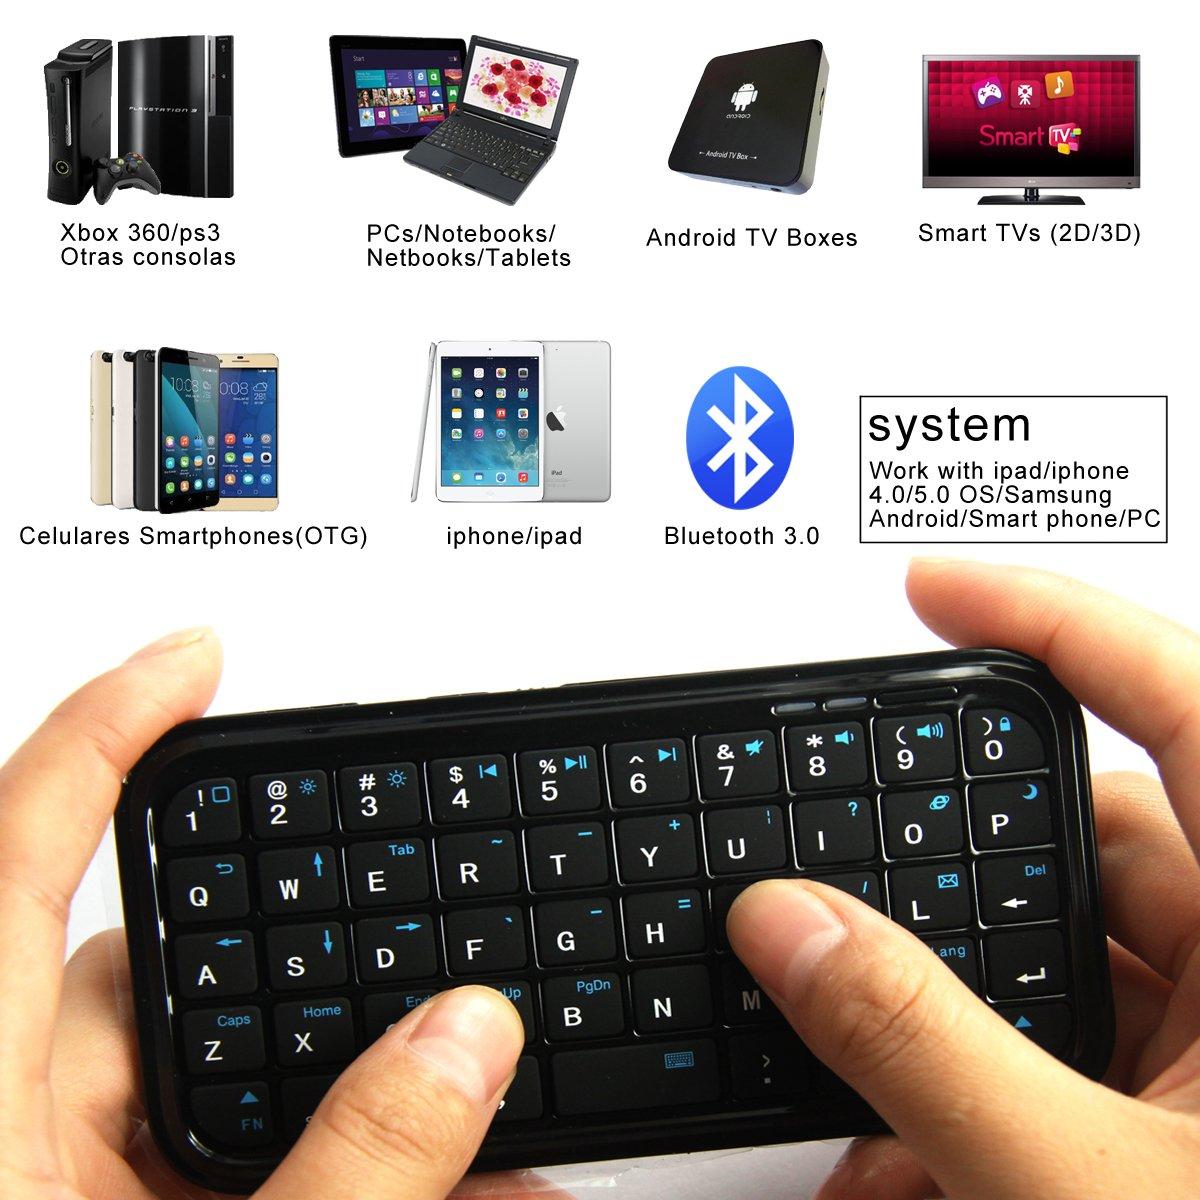 BK103 Mini Teclado inalámbrico para Movíles Teléfonos iPhone BQ Samsung Color Negro: Amazon.es: Electrónica